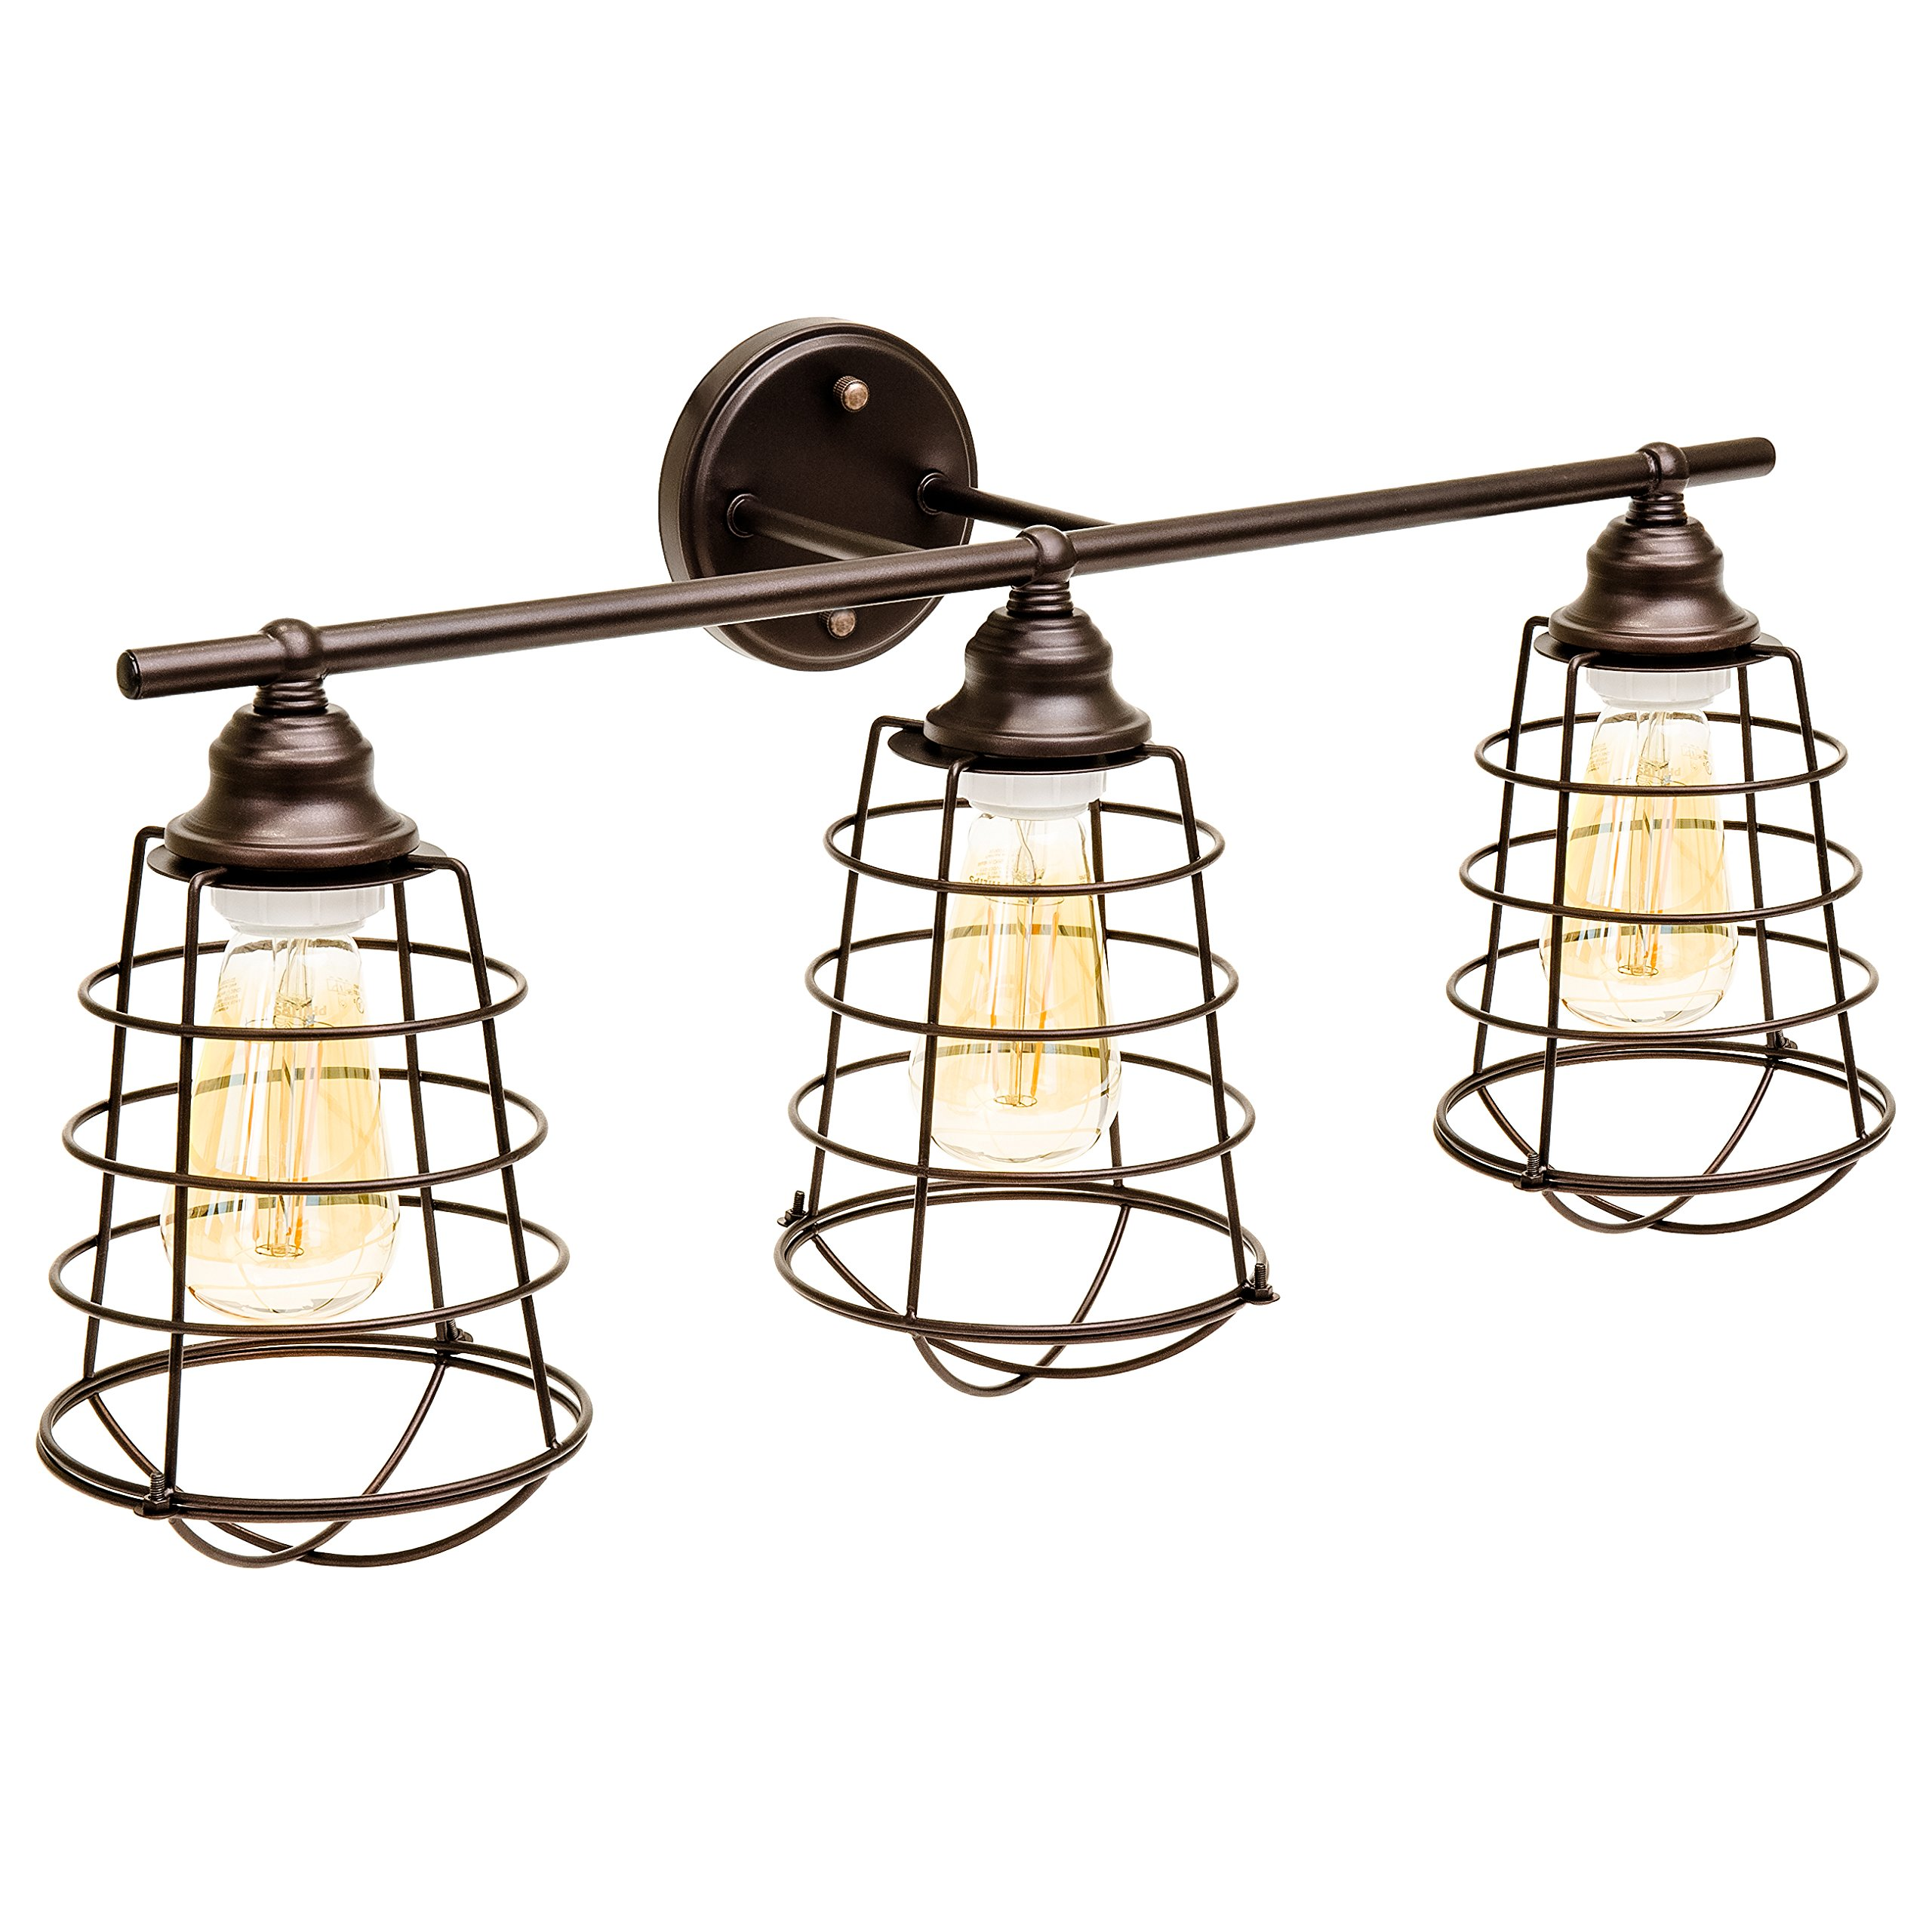 Best Choice Products Industrial Style, 3 Light, Bathroom Vanity Light Fixture (Bronze)